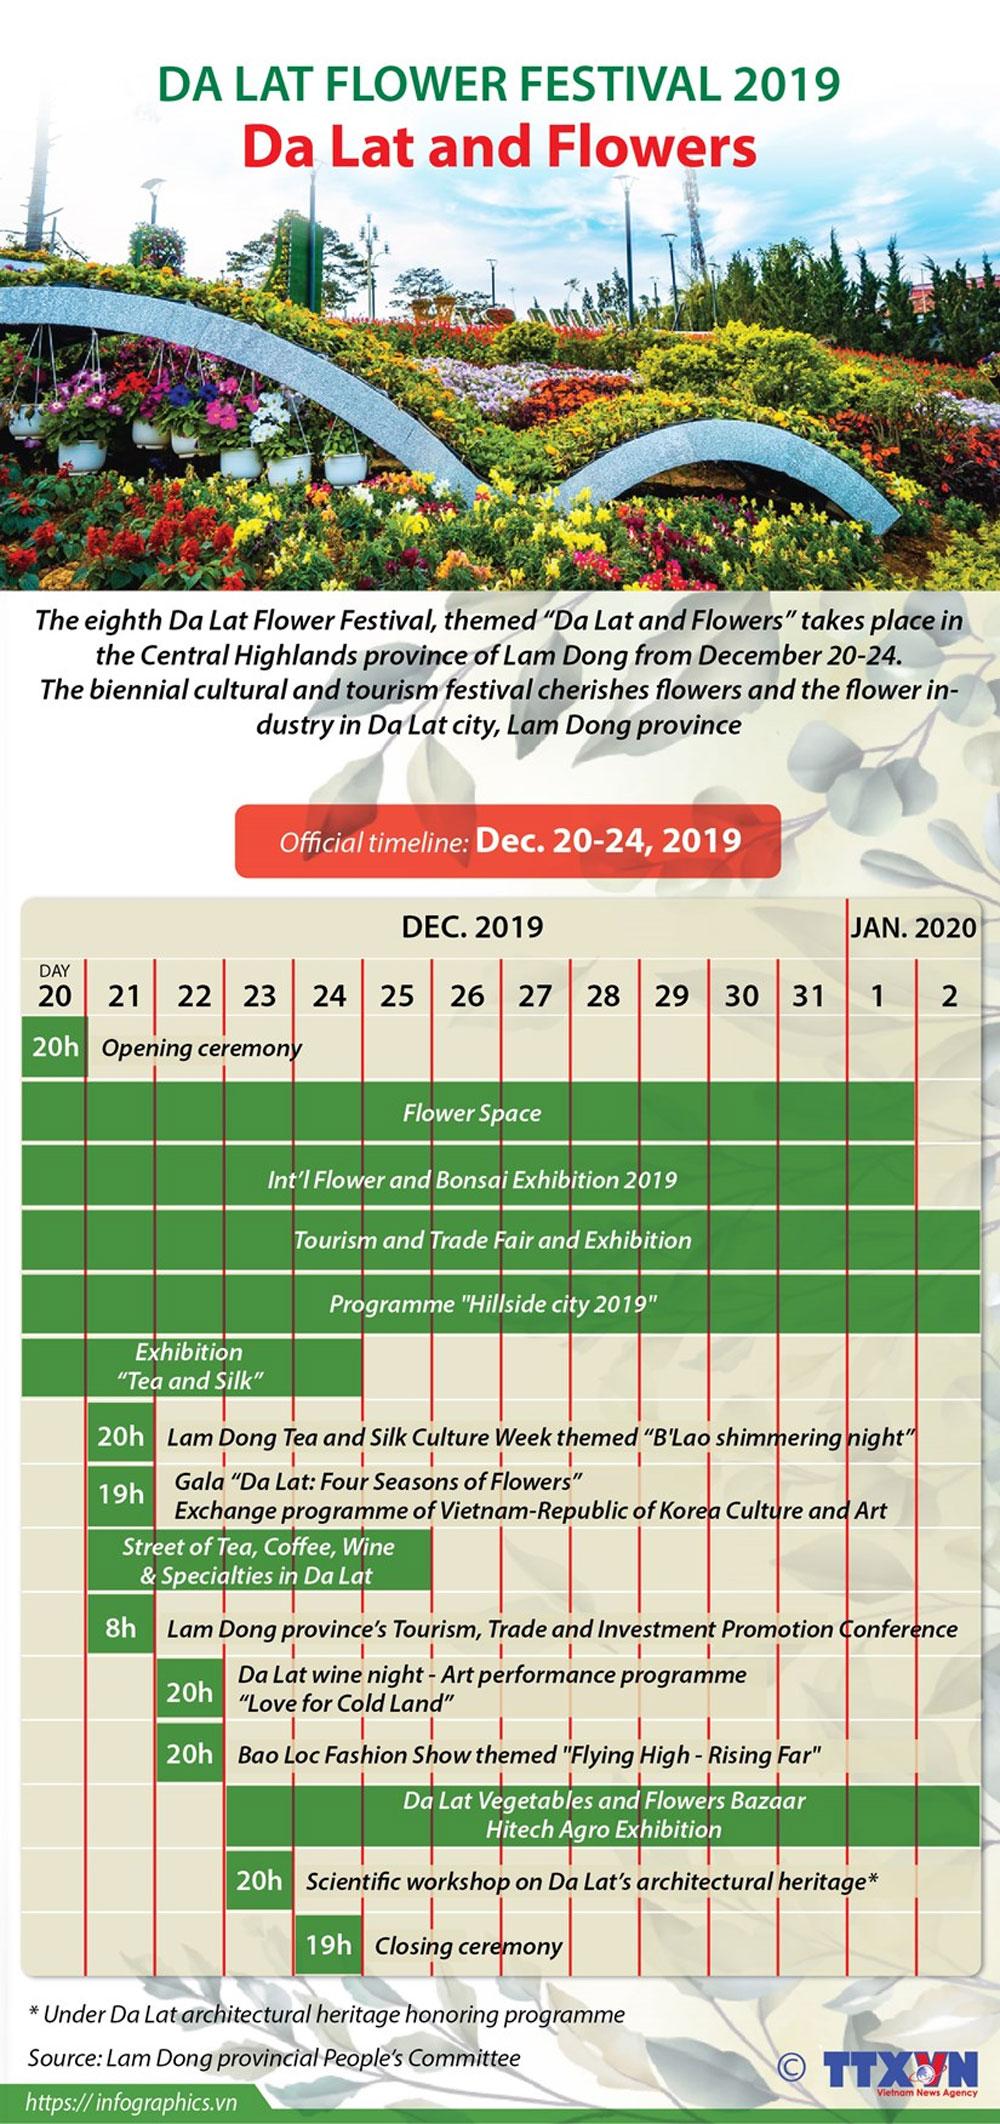 Da Lat Flower Festival 2019, Lam Dong province, Da Lat and Flowers, popular destination